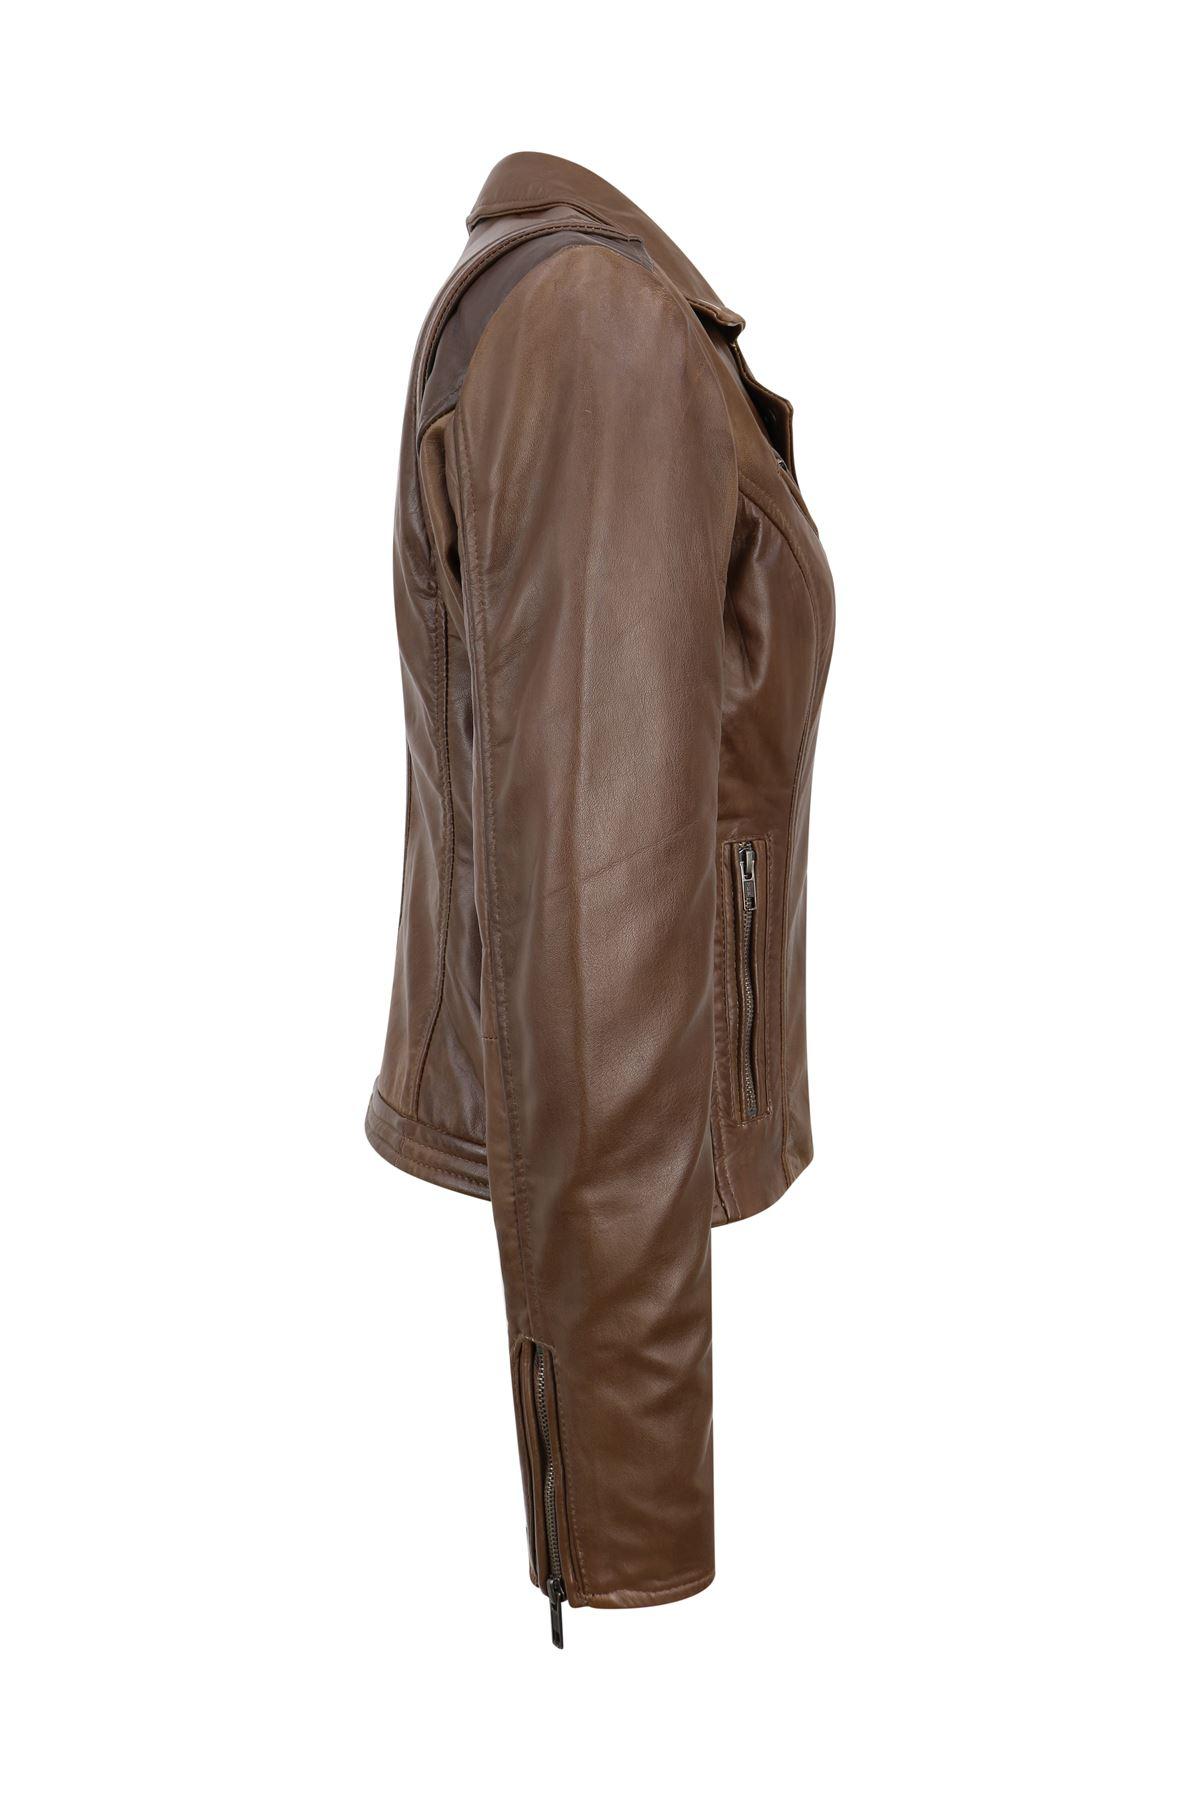 Blouson-femme-cuir-Napa-veritable-fermeture-zip-diagonale-ajuste miniature 4